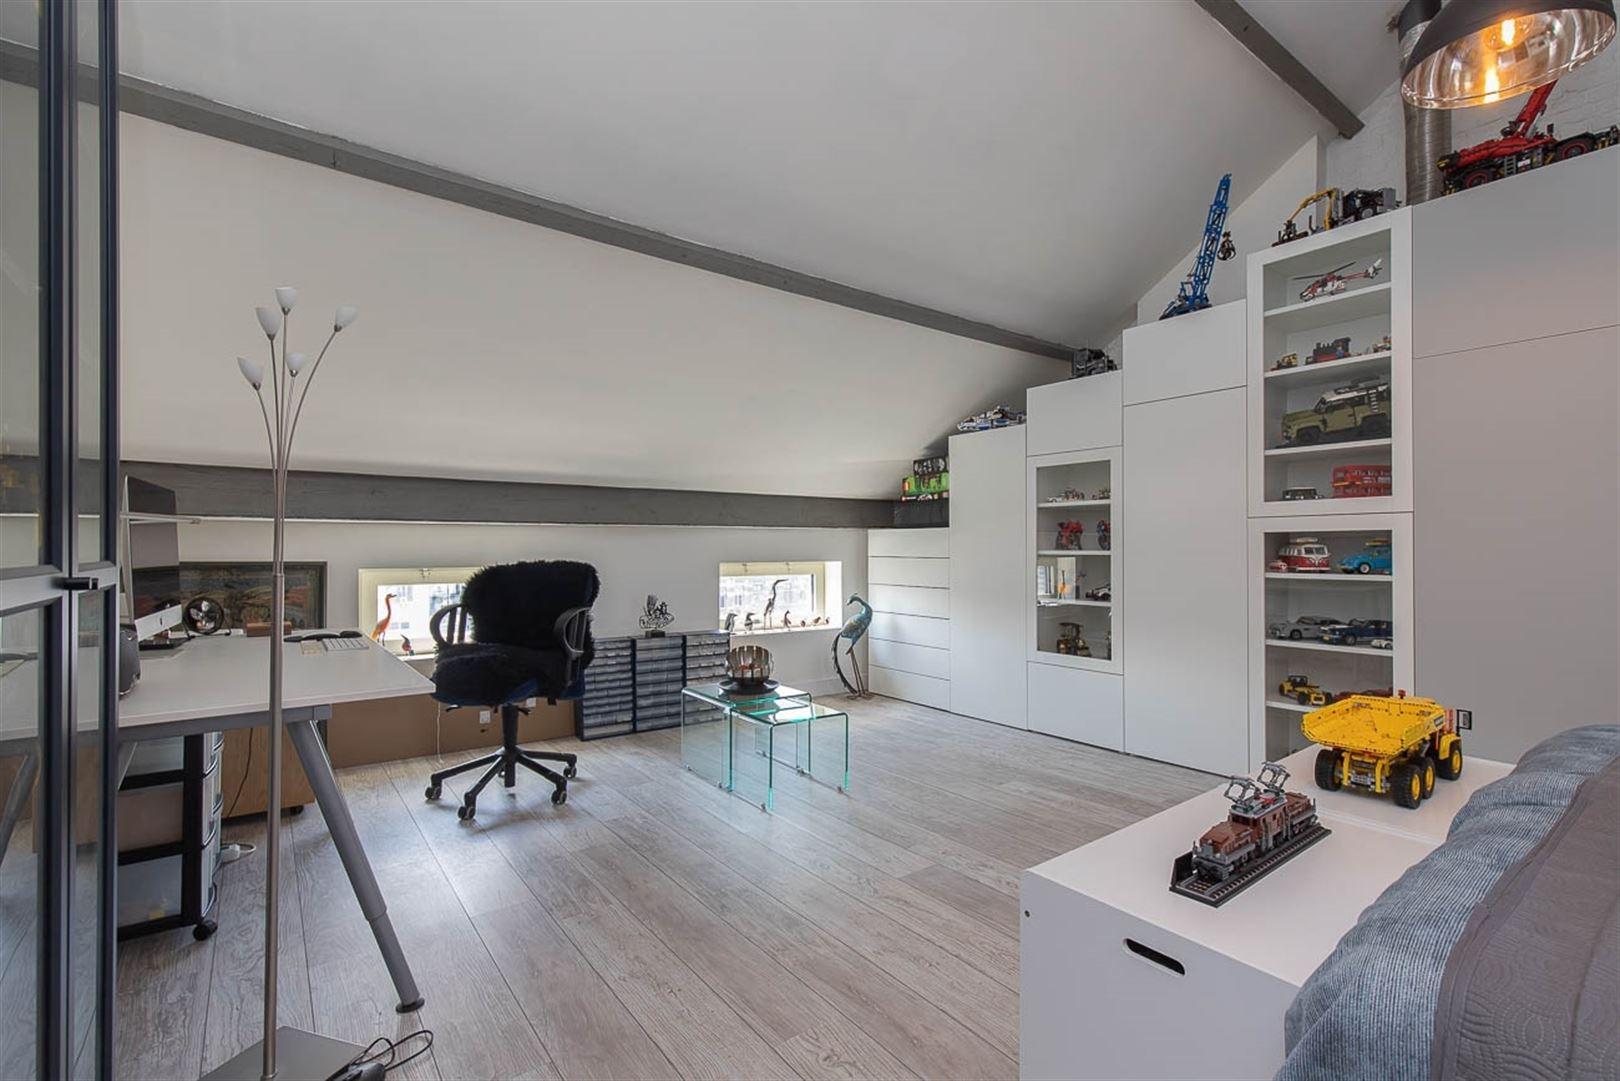 Foto 27 : Woning te 9200 DENDERMONDE (België) - Prijs € 495.000